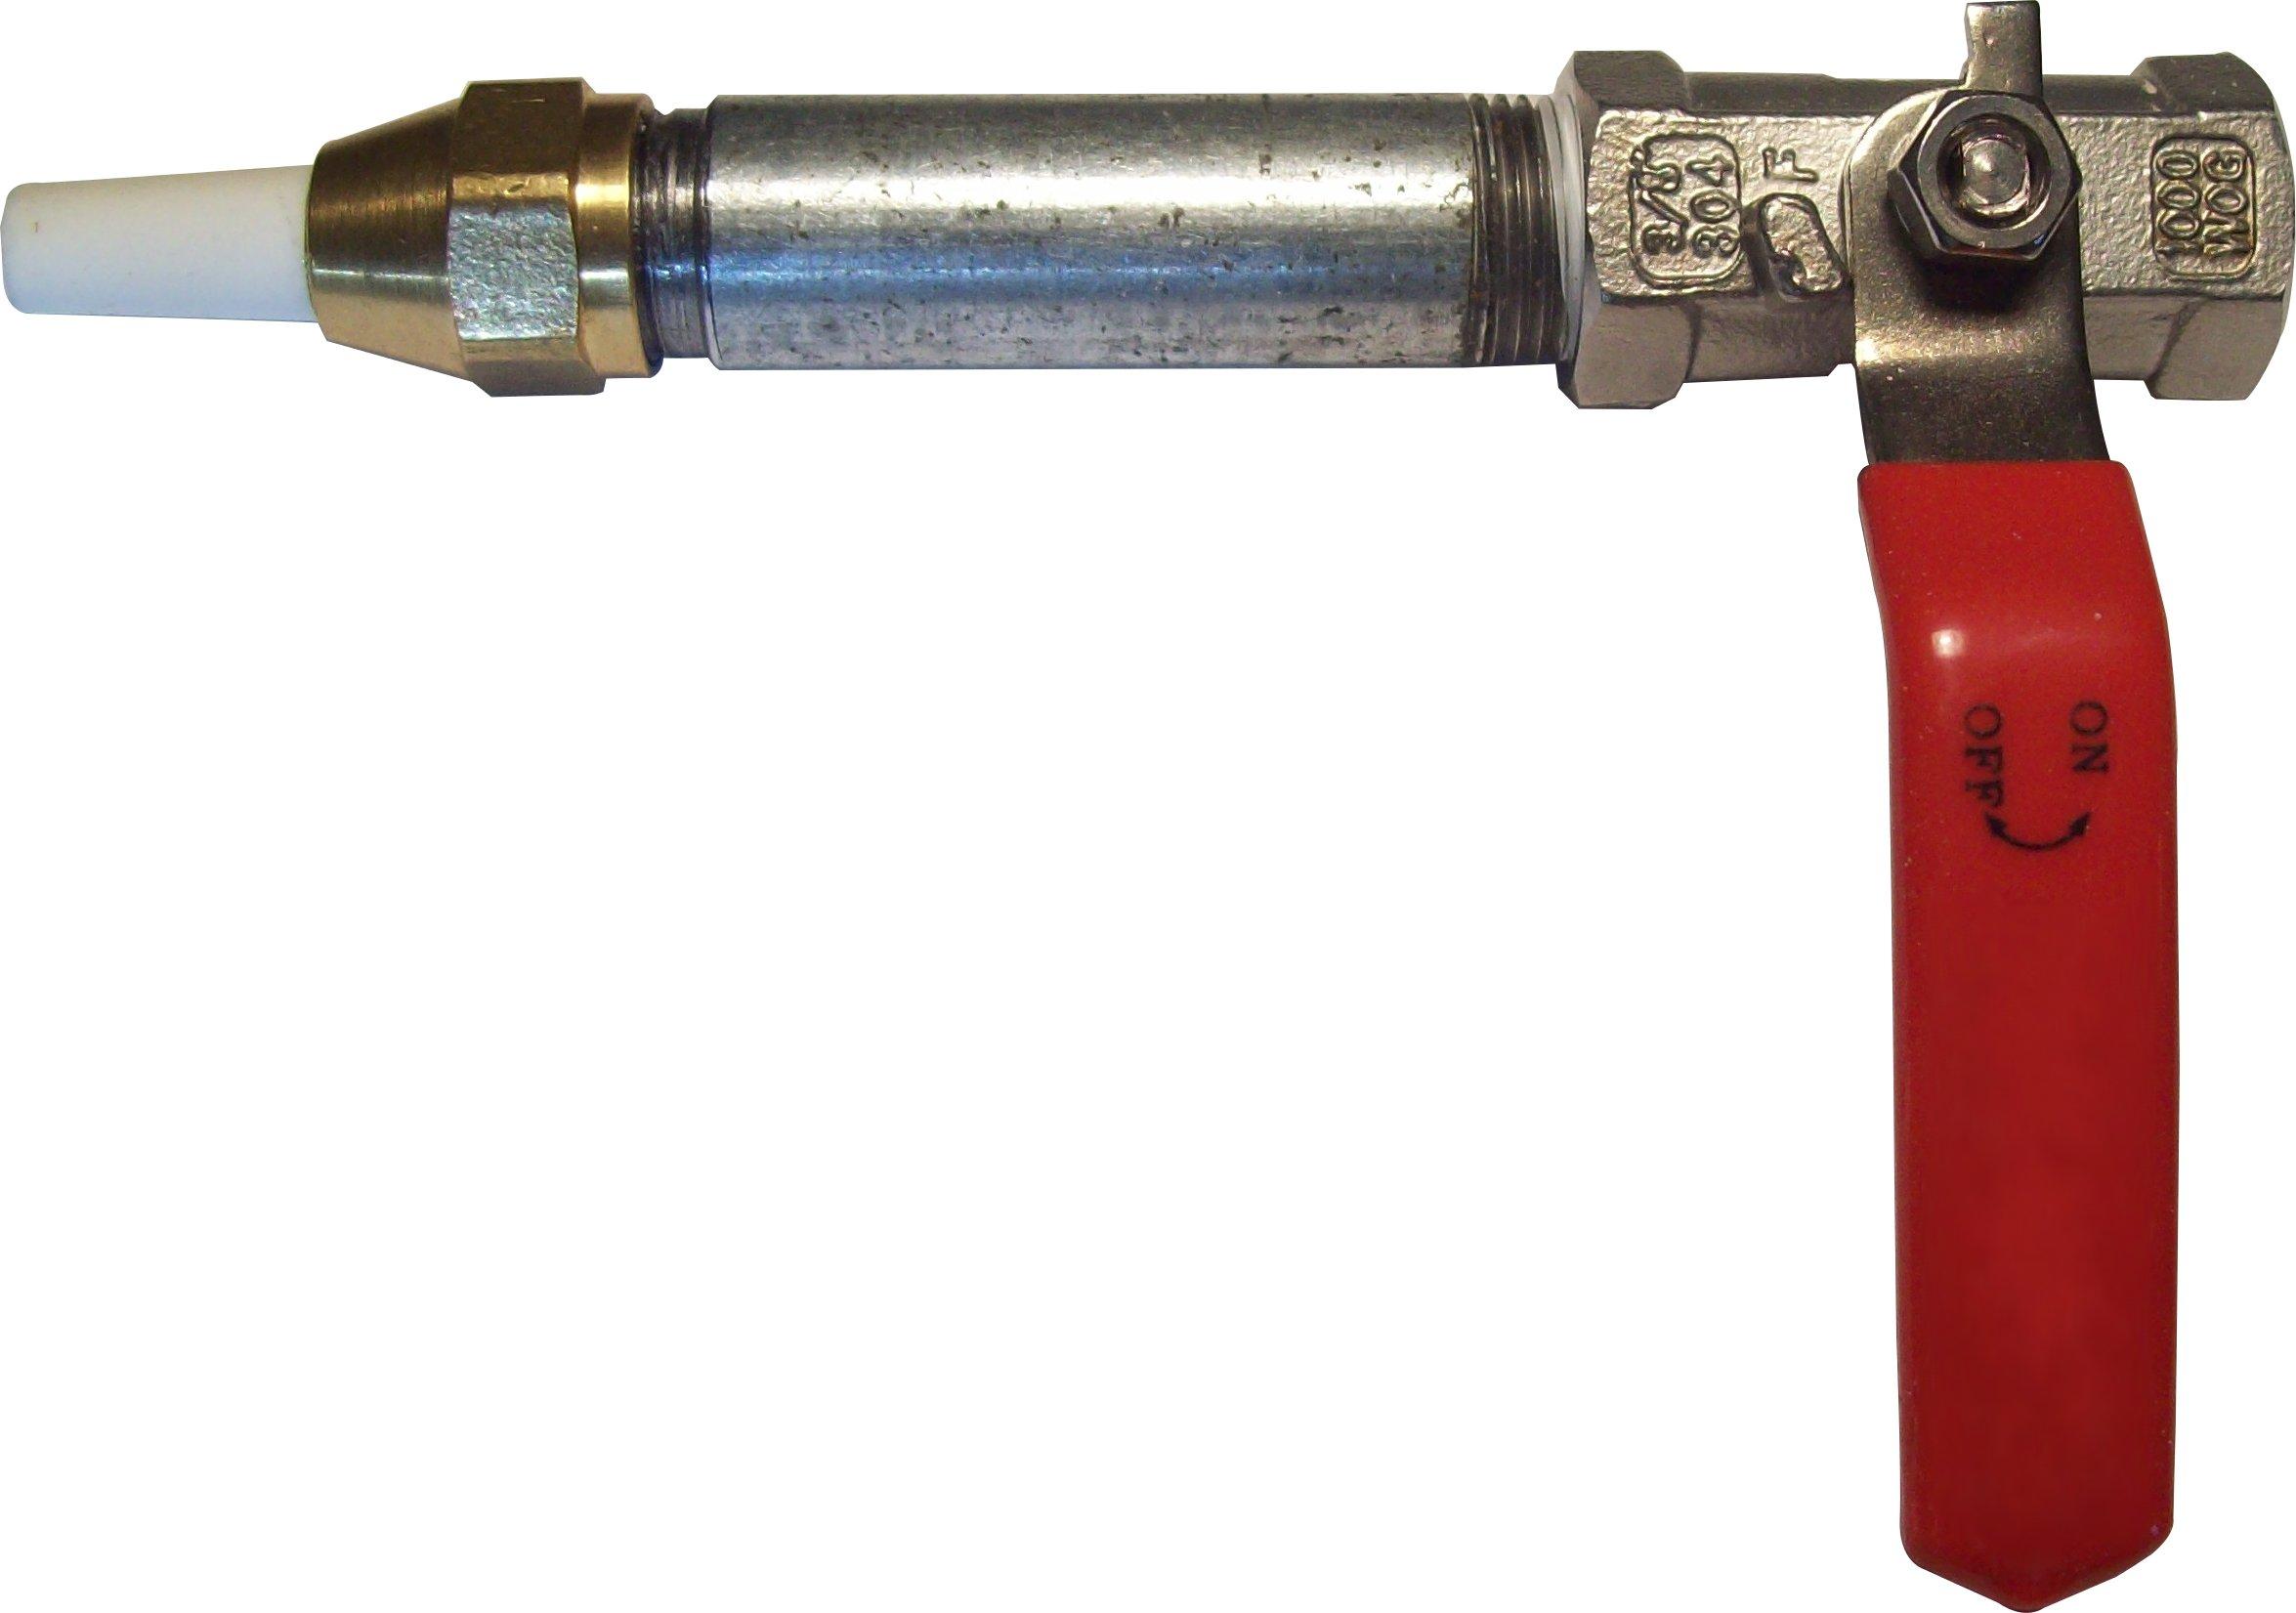 Sandblaster Nozzle Gun with Holder, Valve, Tip, Long-Lasting Steel by Abrasive Mechanics